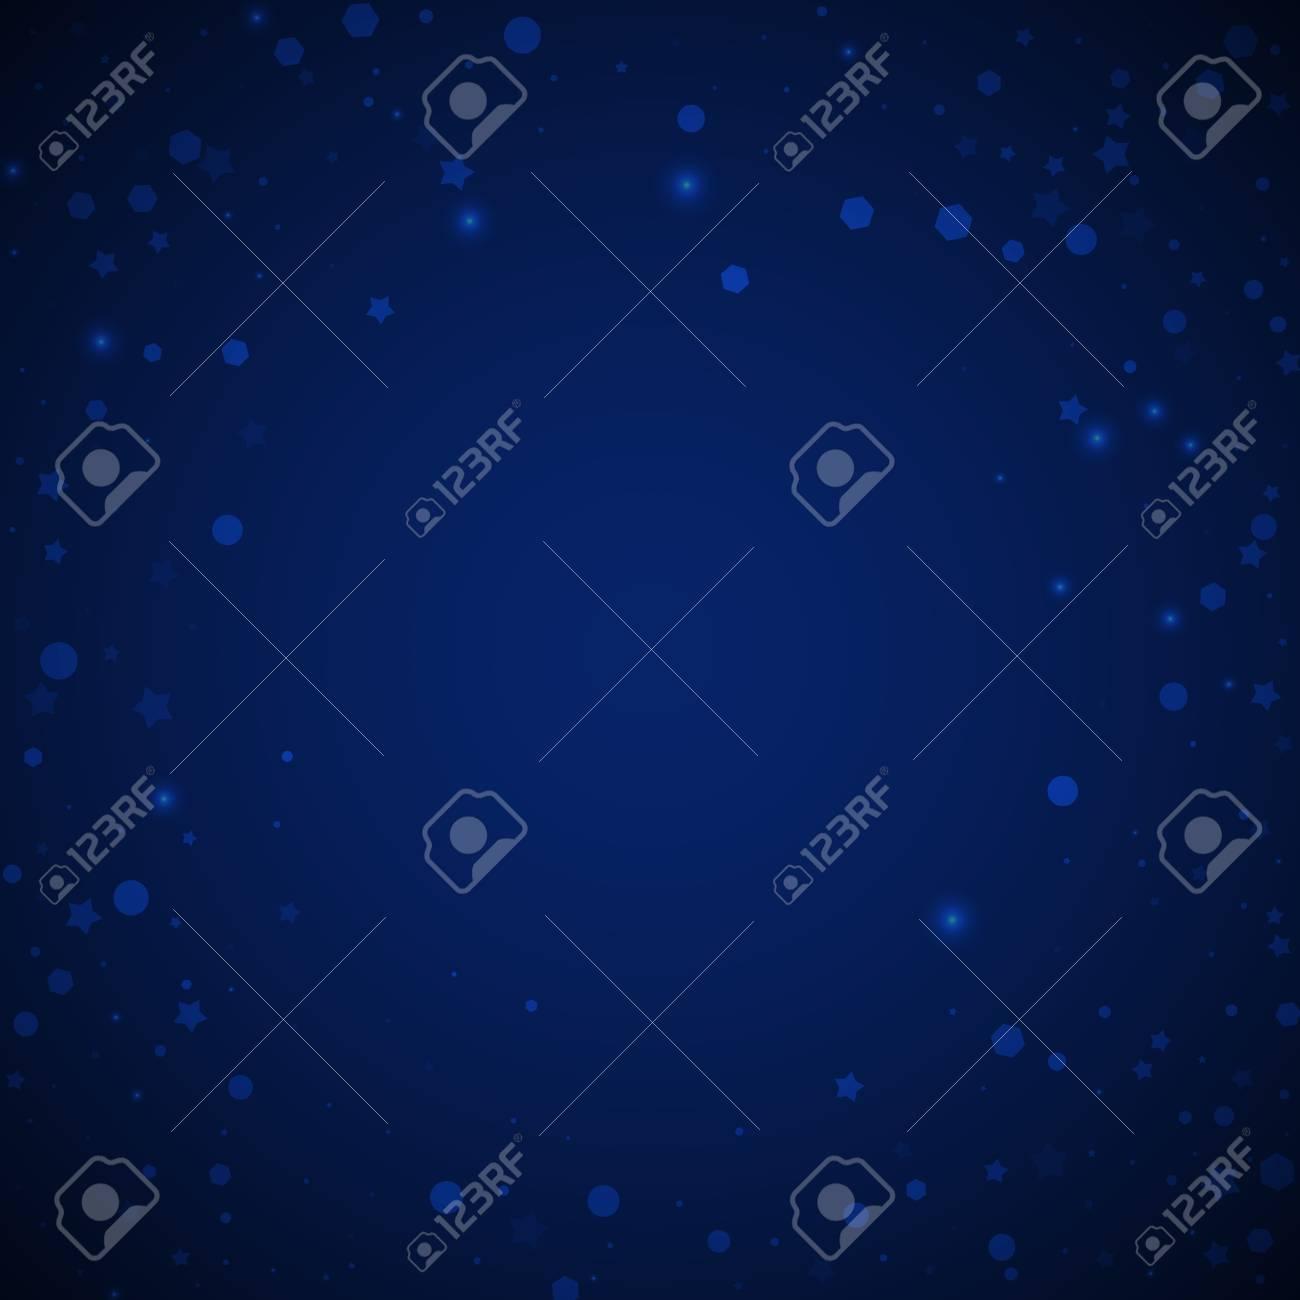 Magic stars random Christmas background. Subtle flying snow flakes and stars on dark blue night background. Amazing winter silver snowflake overlay template. Stunning vector illustration. - 126652535